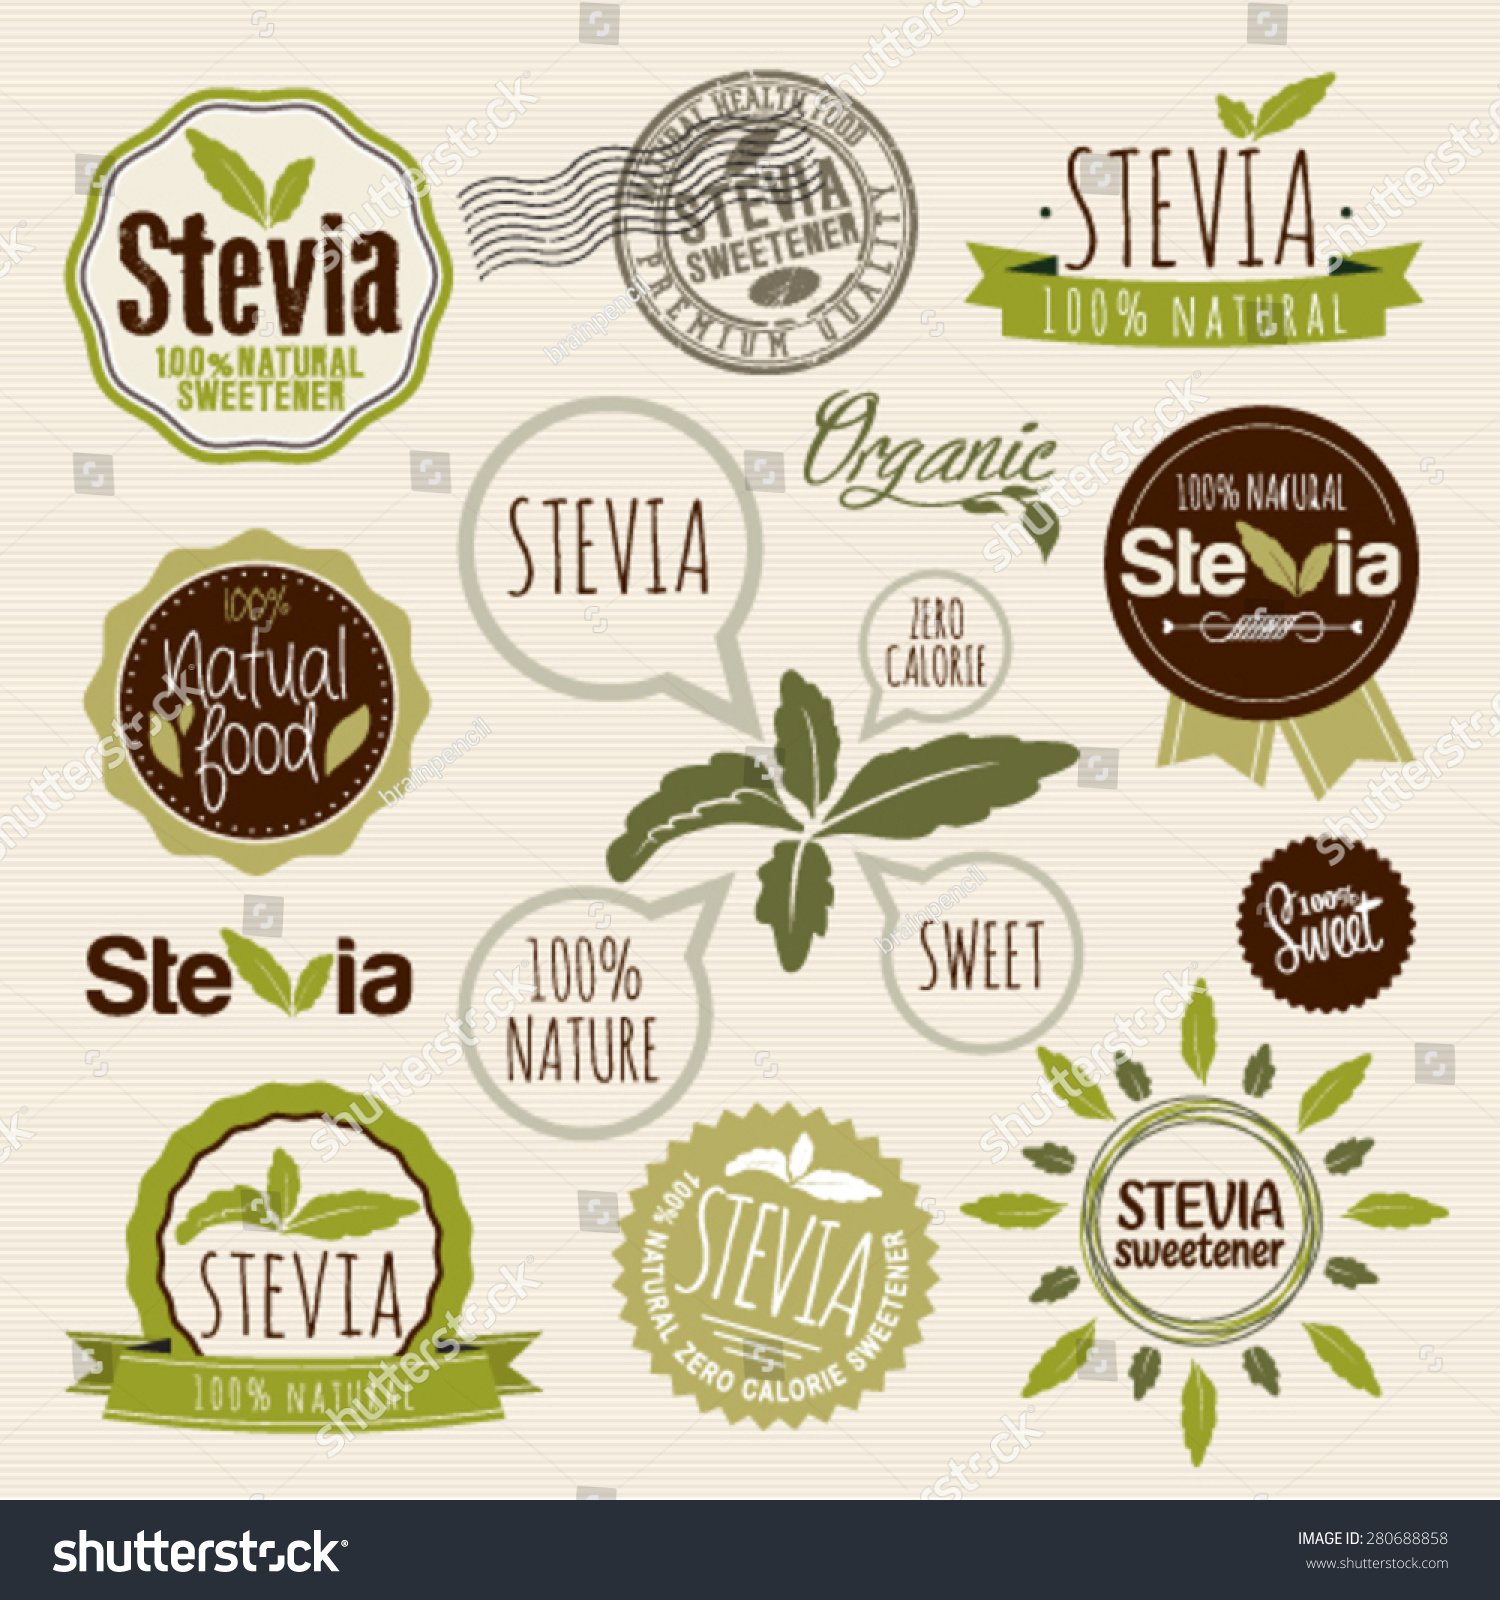 Stevia Organic Food Label Set Farm Stock Vector 280688858